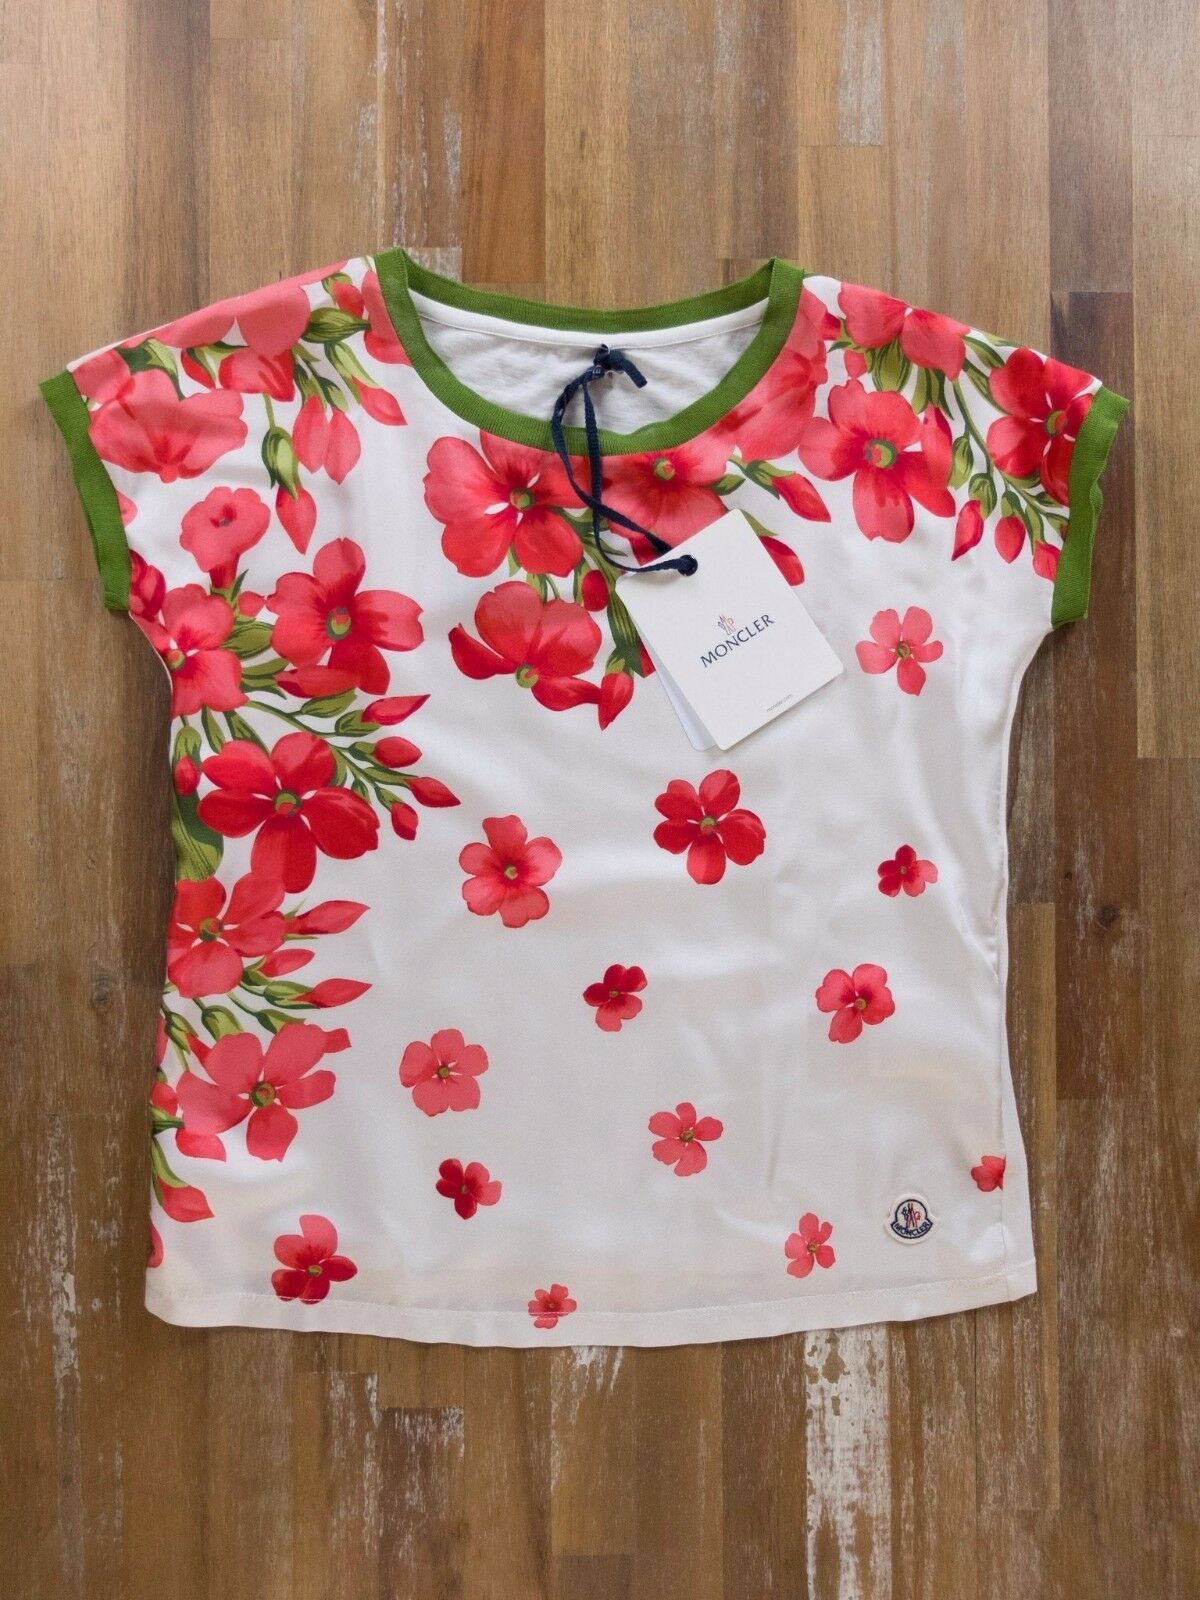 Moncler Blouse Silk Floral T shirt Italy Ladies Authentic Size XS